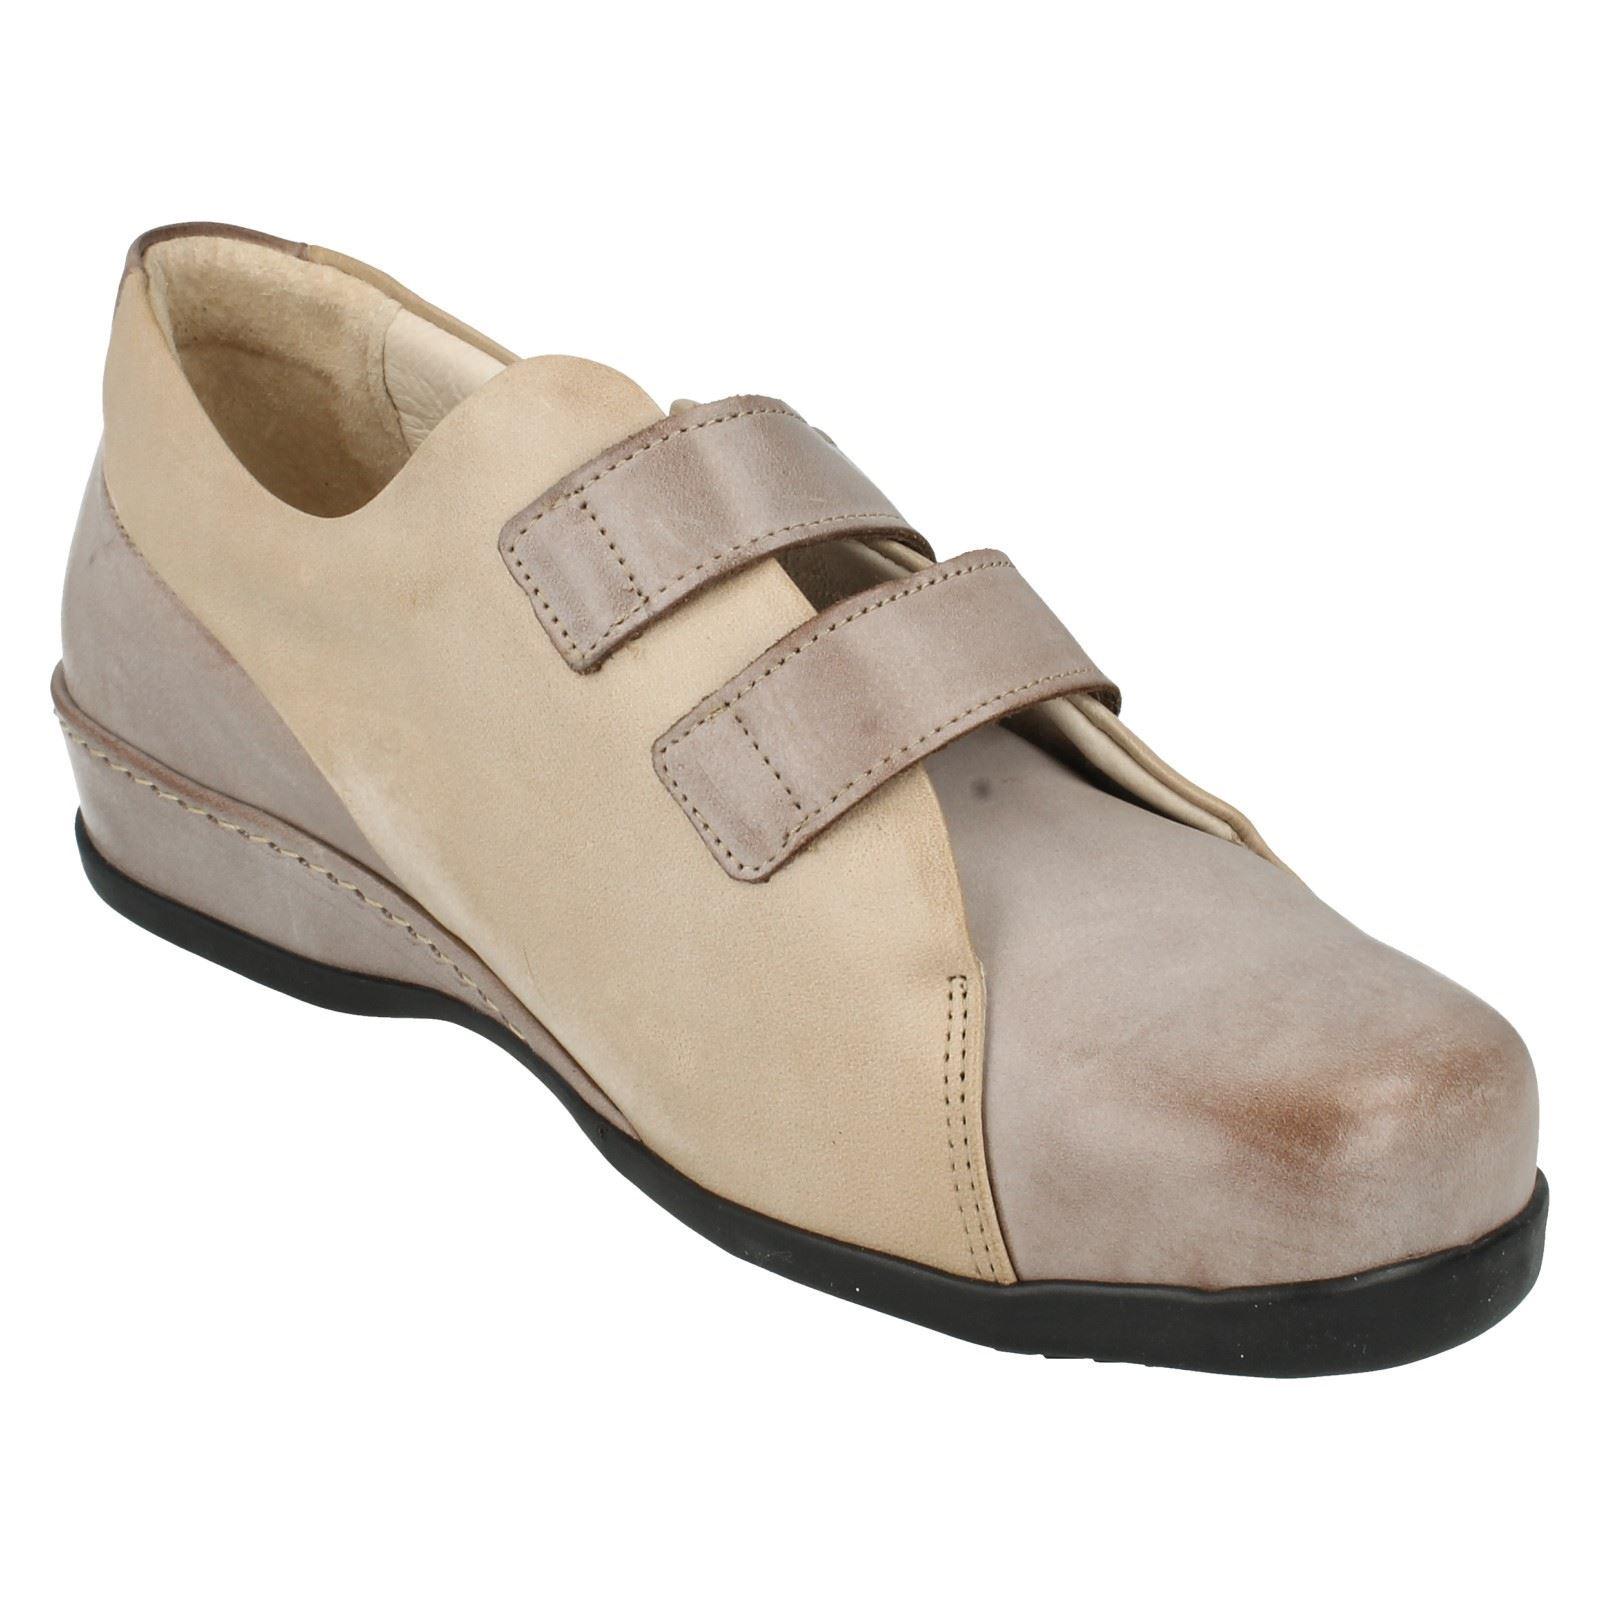 R7A Sandpiper Weston Ladies Chestnut Shoes